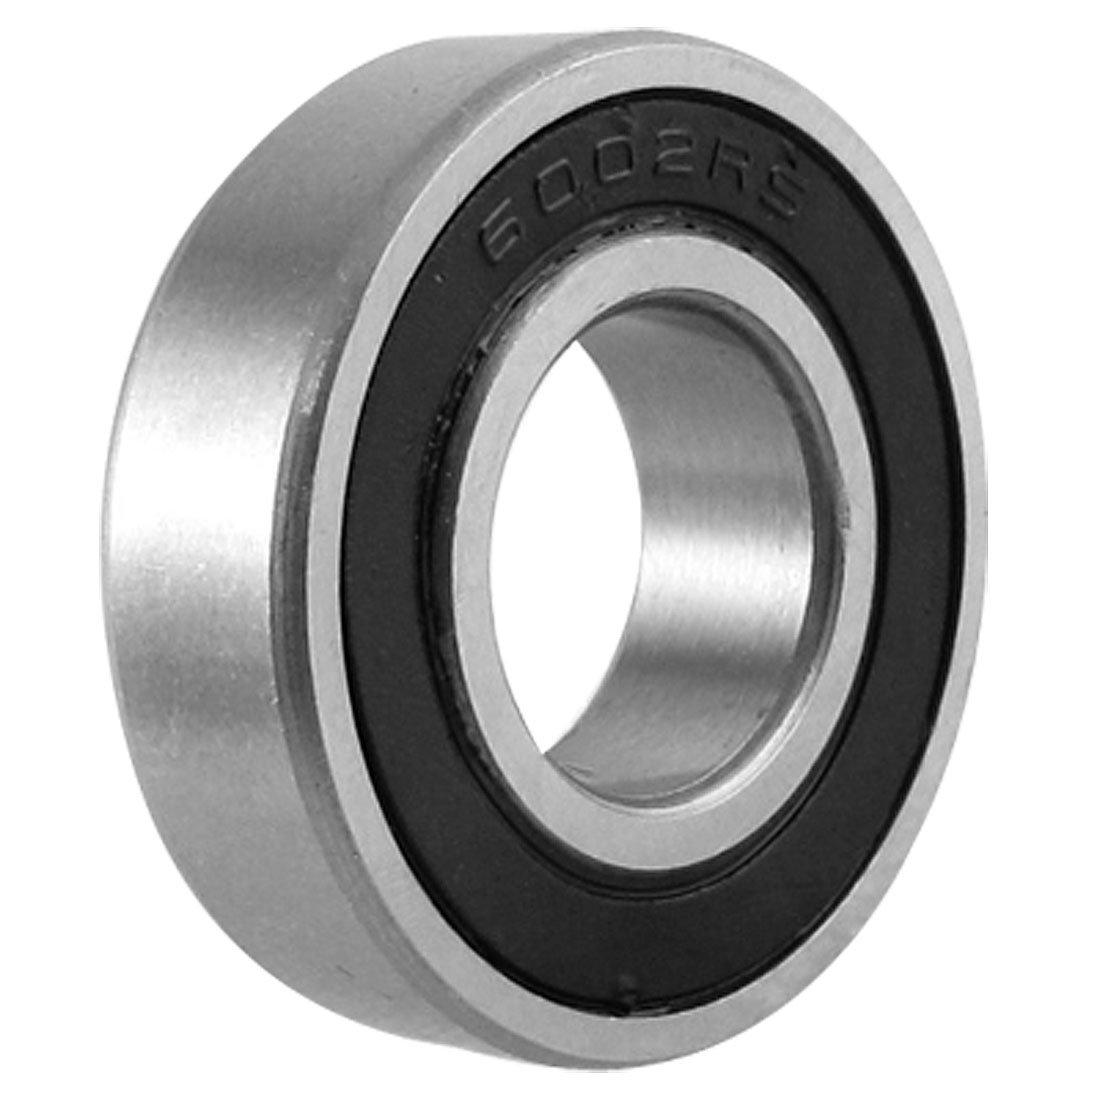 "G100 1.5mm // 0.0591/"" 316 Stainless Steel Bearing Balls Grade 100 2500 PCS"